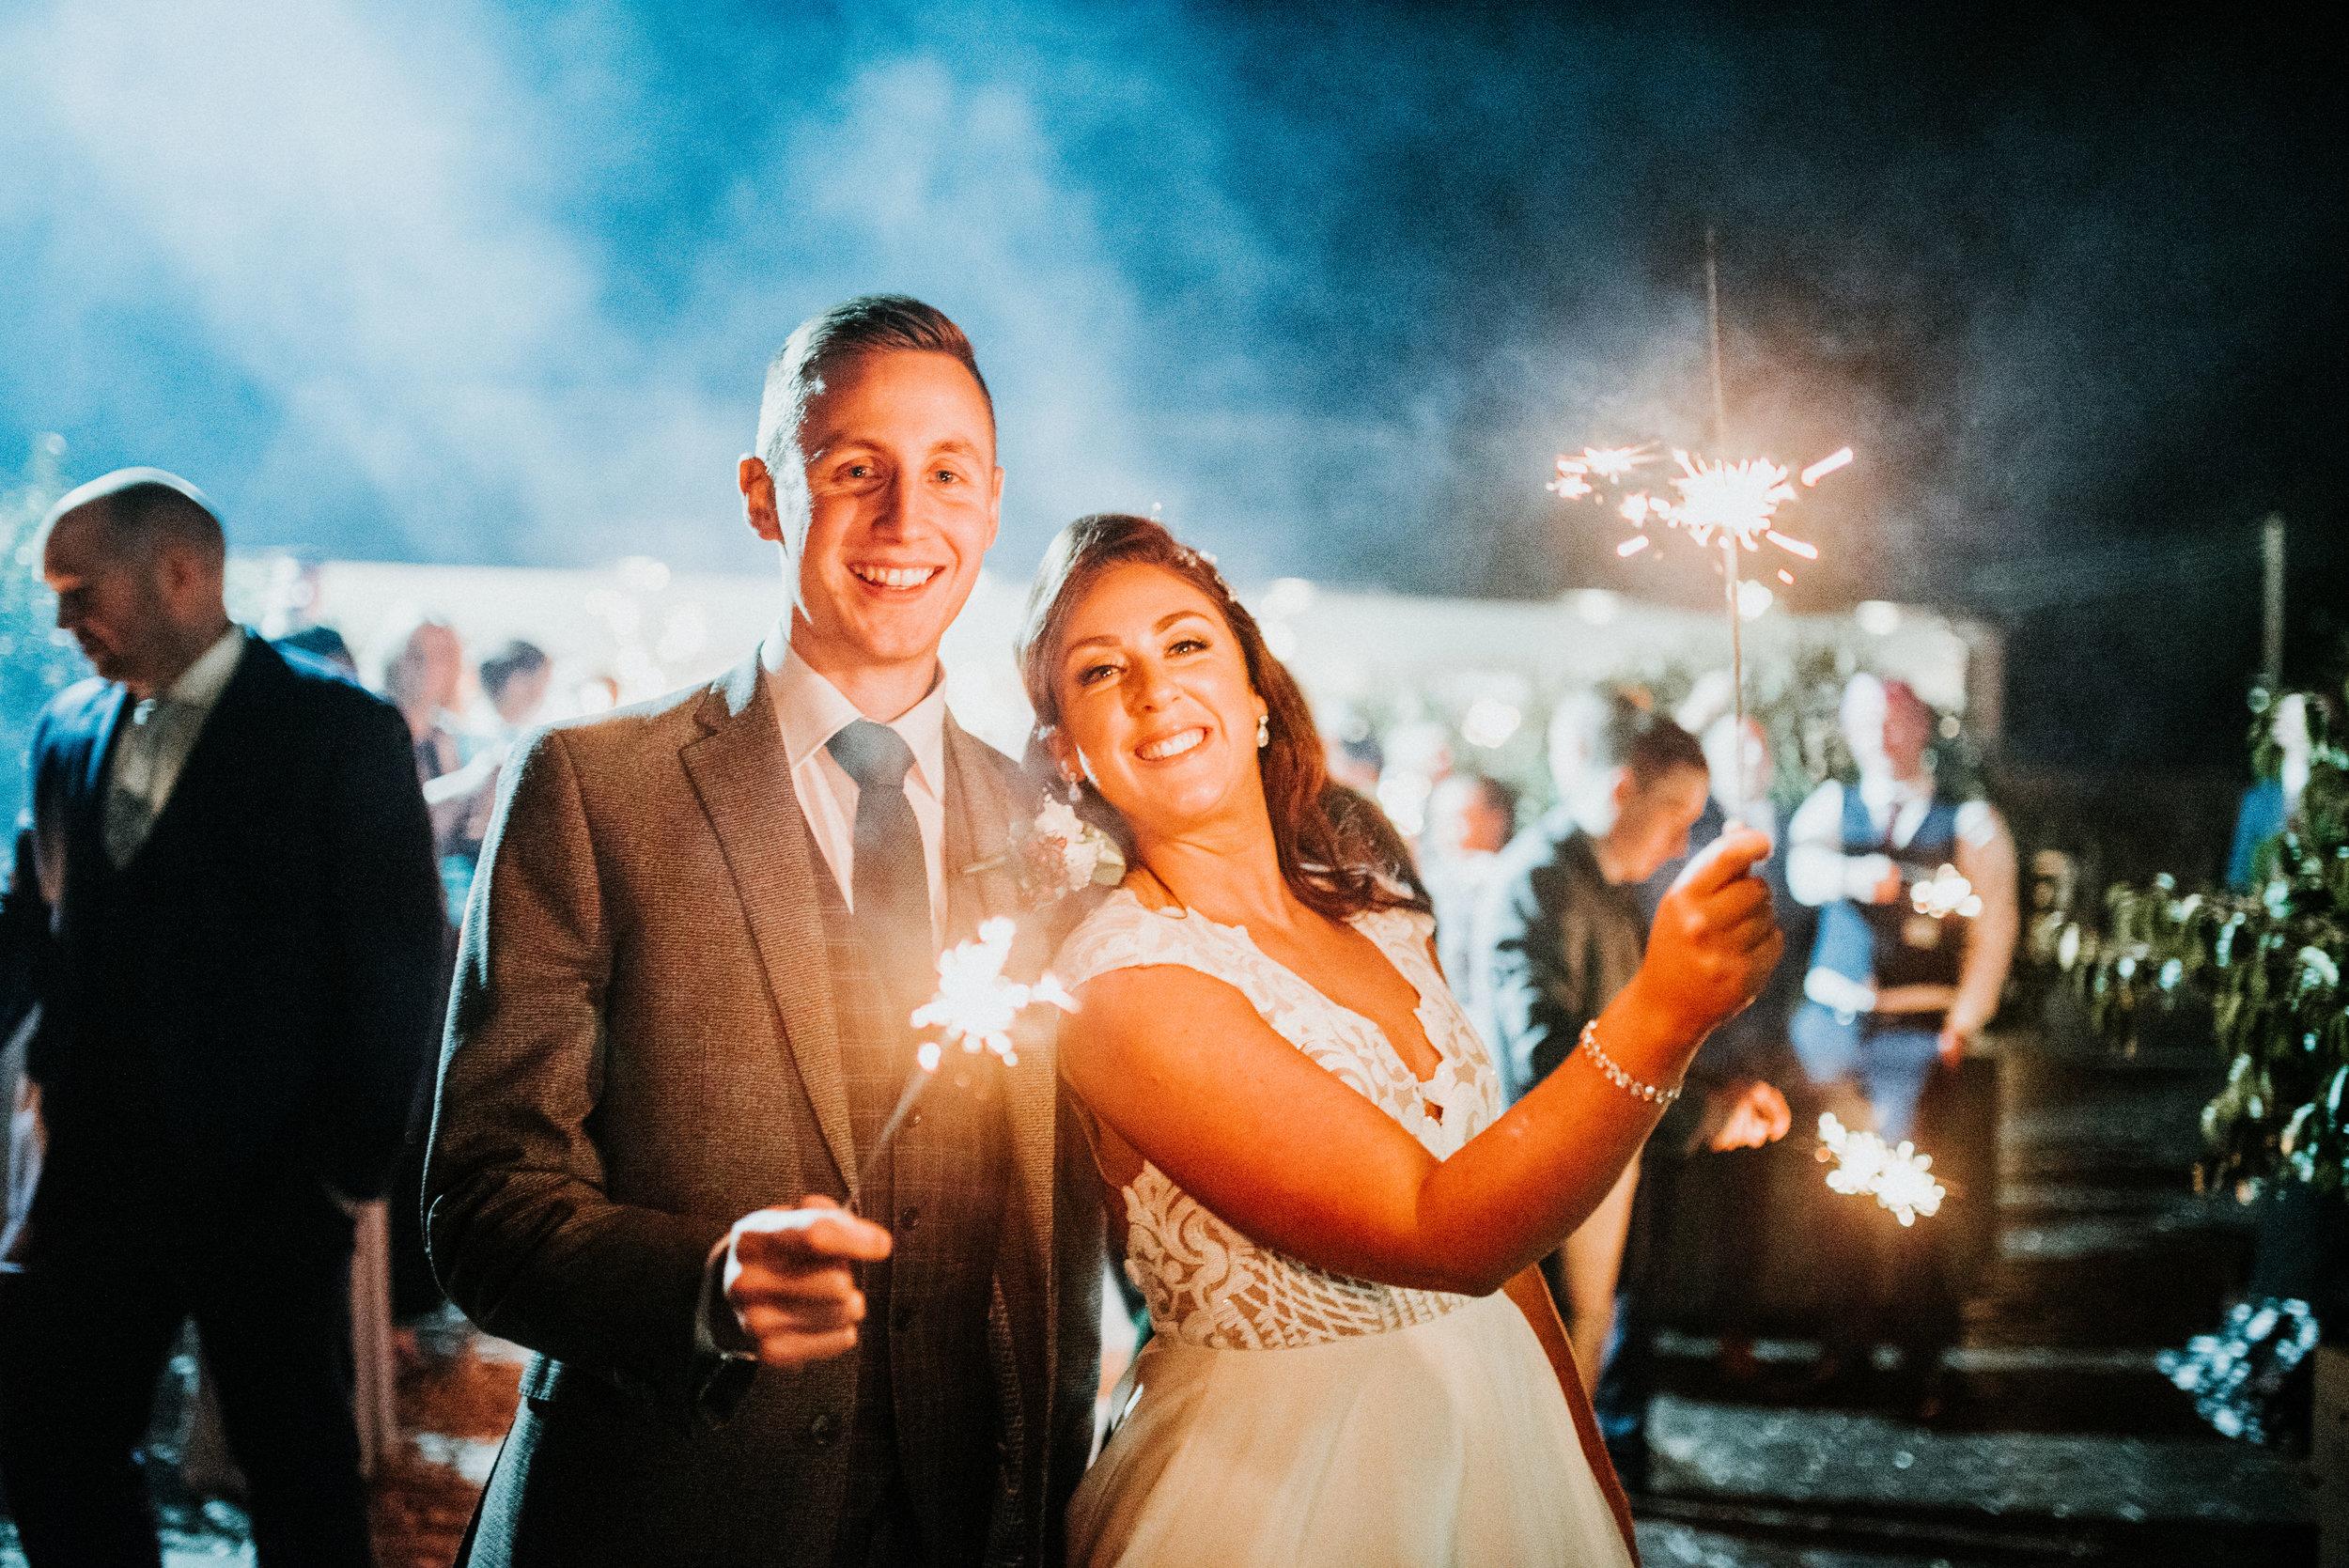 larchfield estate wedding, wedding venues northern ireland, barn wedding venues northern ireland, wedding photos larchfield estate, shane todd wedding, wedding sparklers, irish wedding (4).jpg